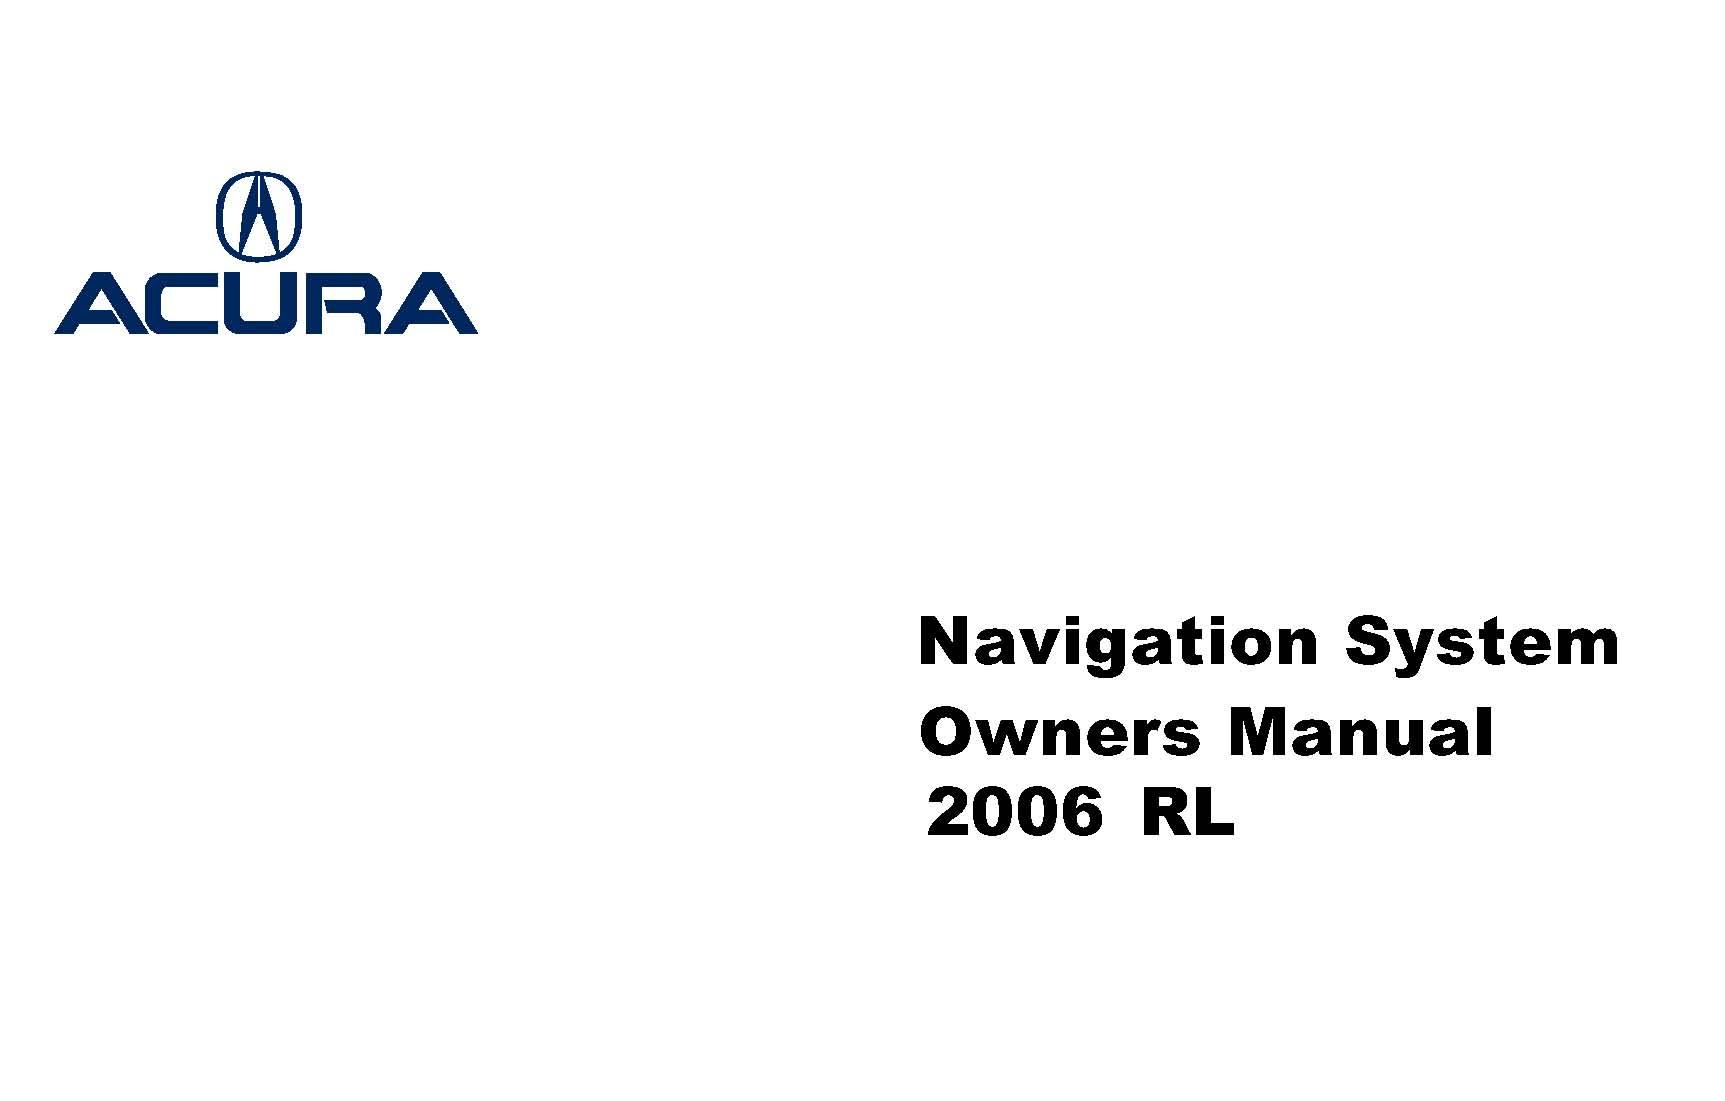 Acura Rl Navigation System Owner Manual 06